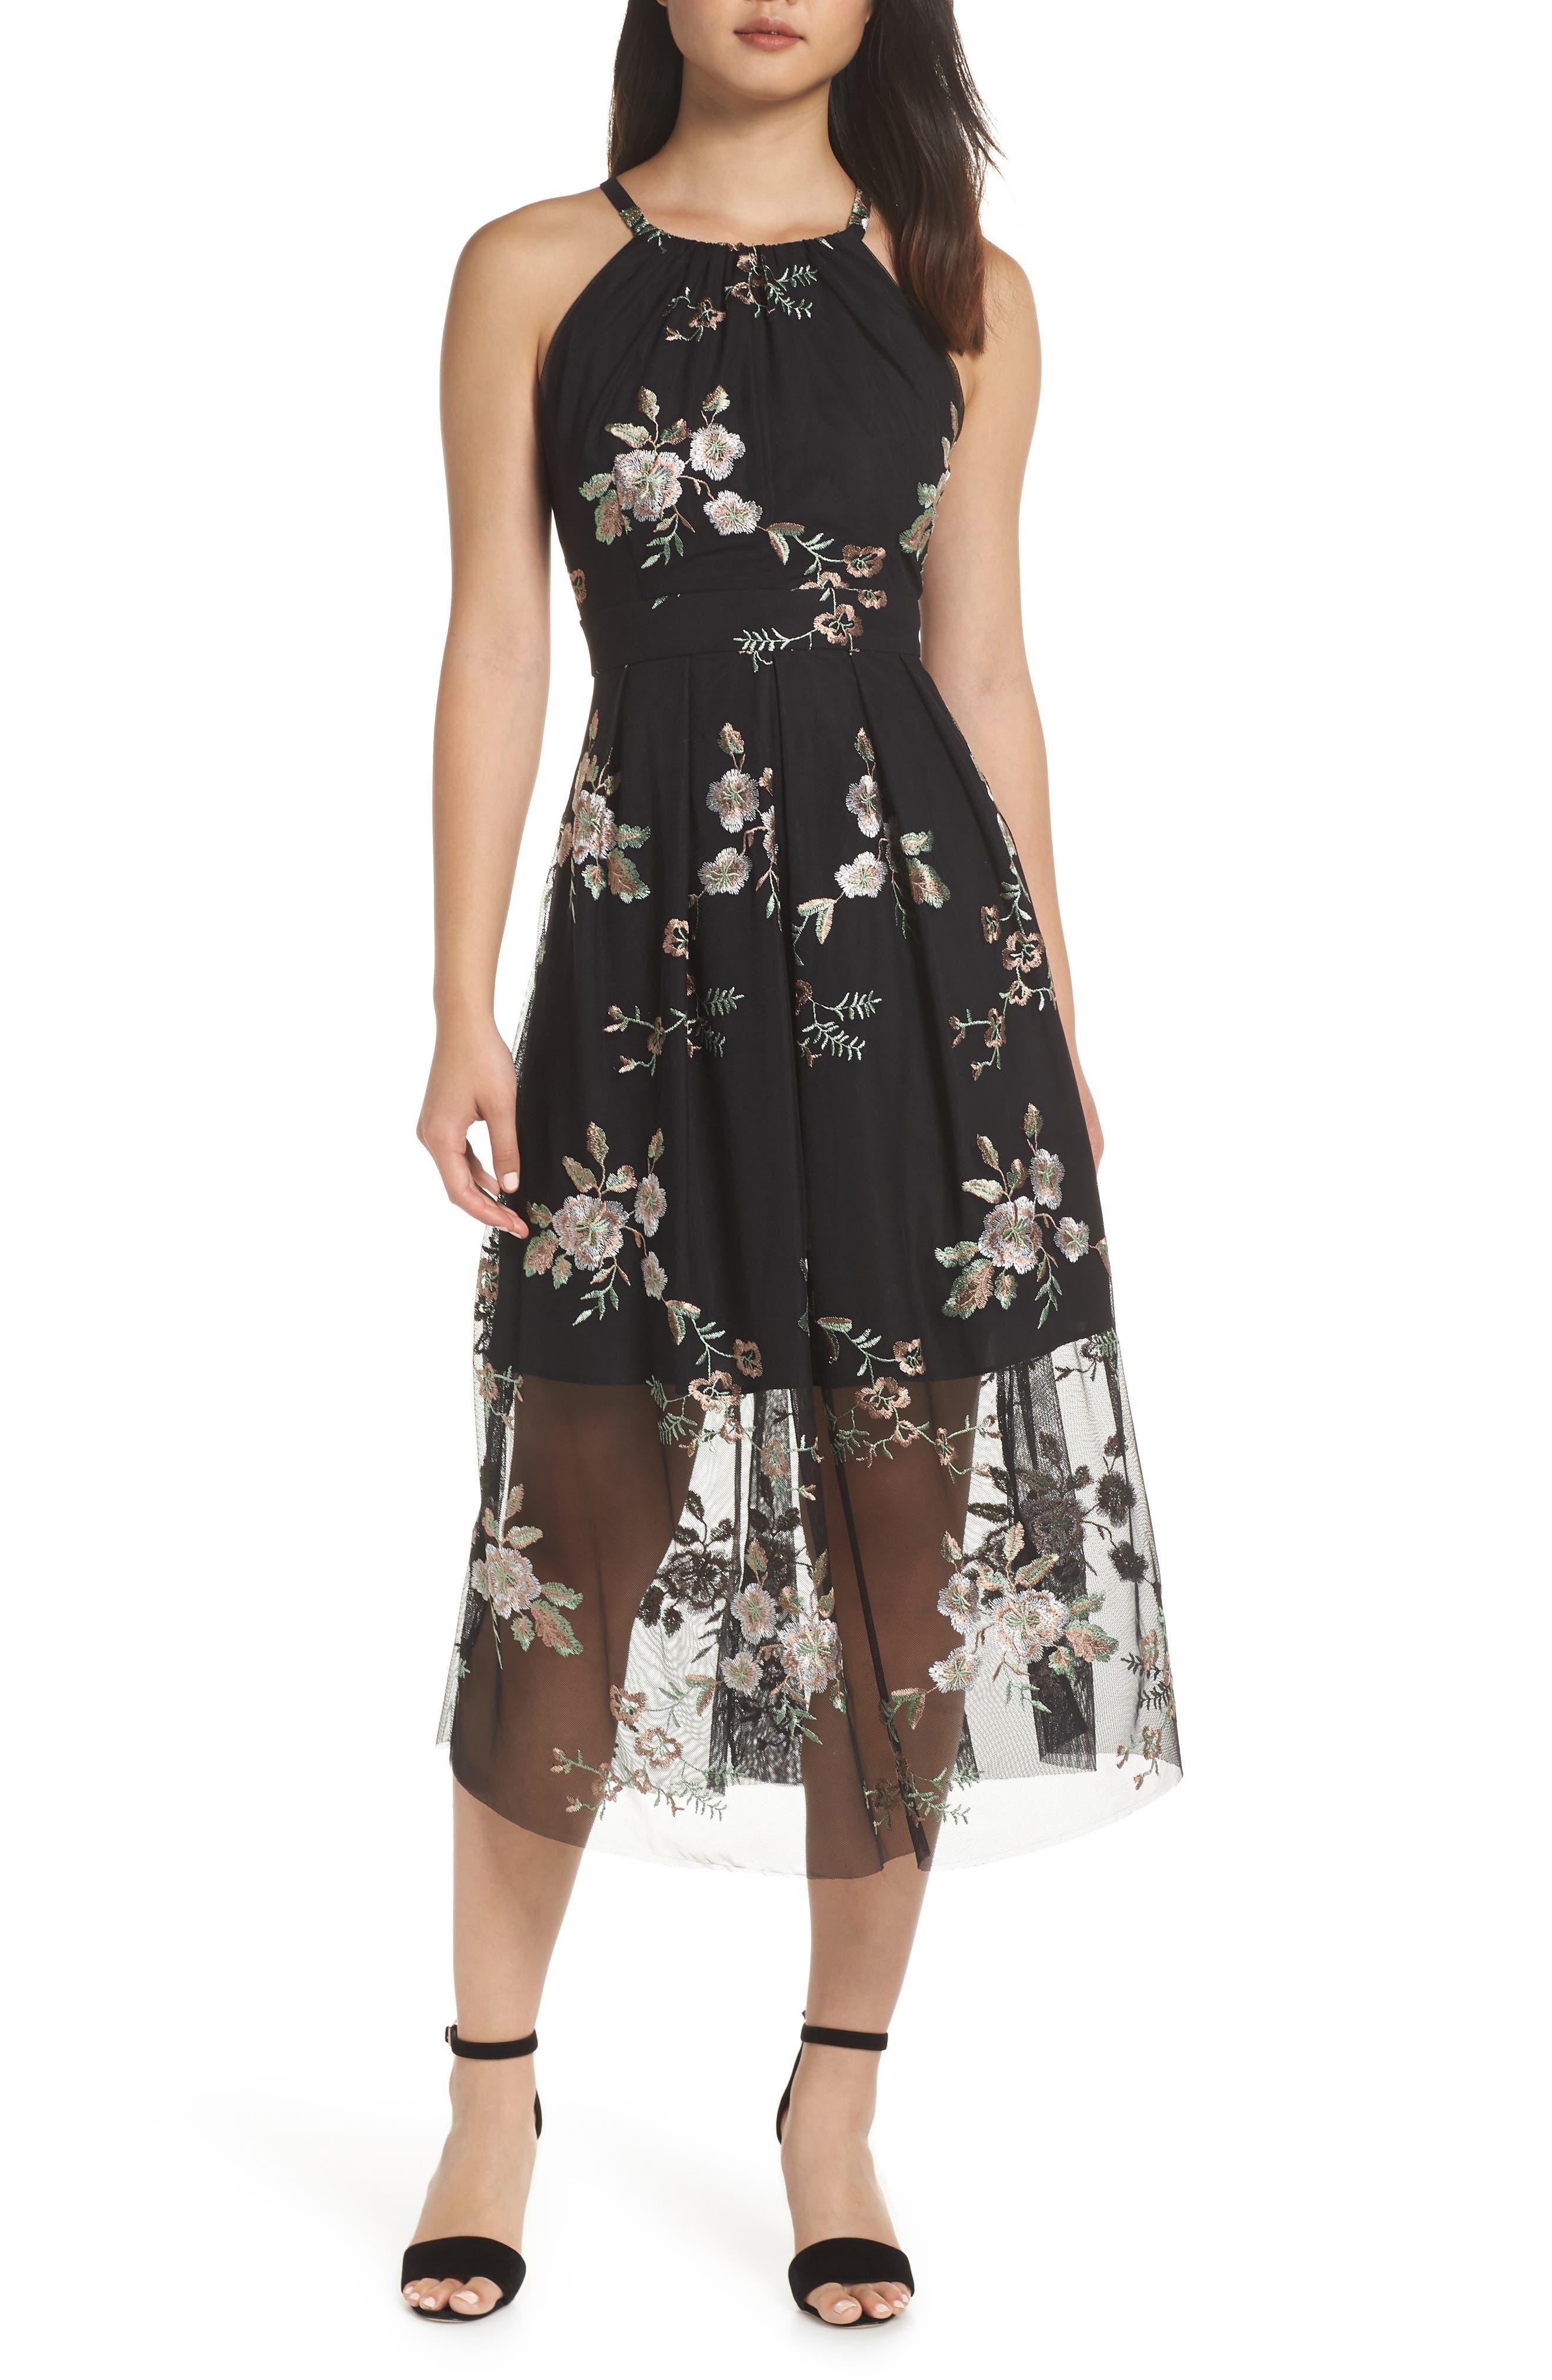 VINCE CAMUTO, Embroidered Mesh Midi Dress, Main thumbnail 1, color, 019